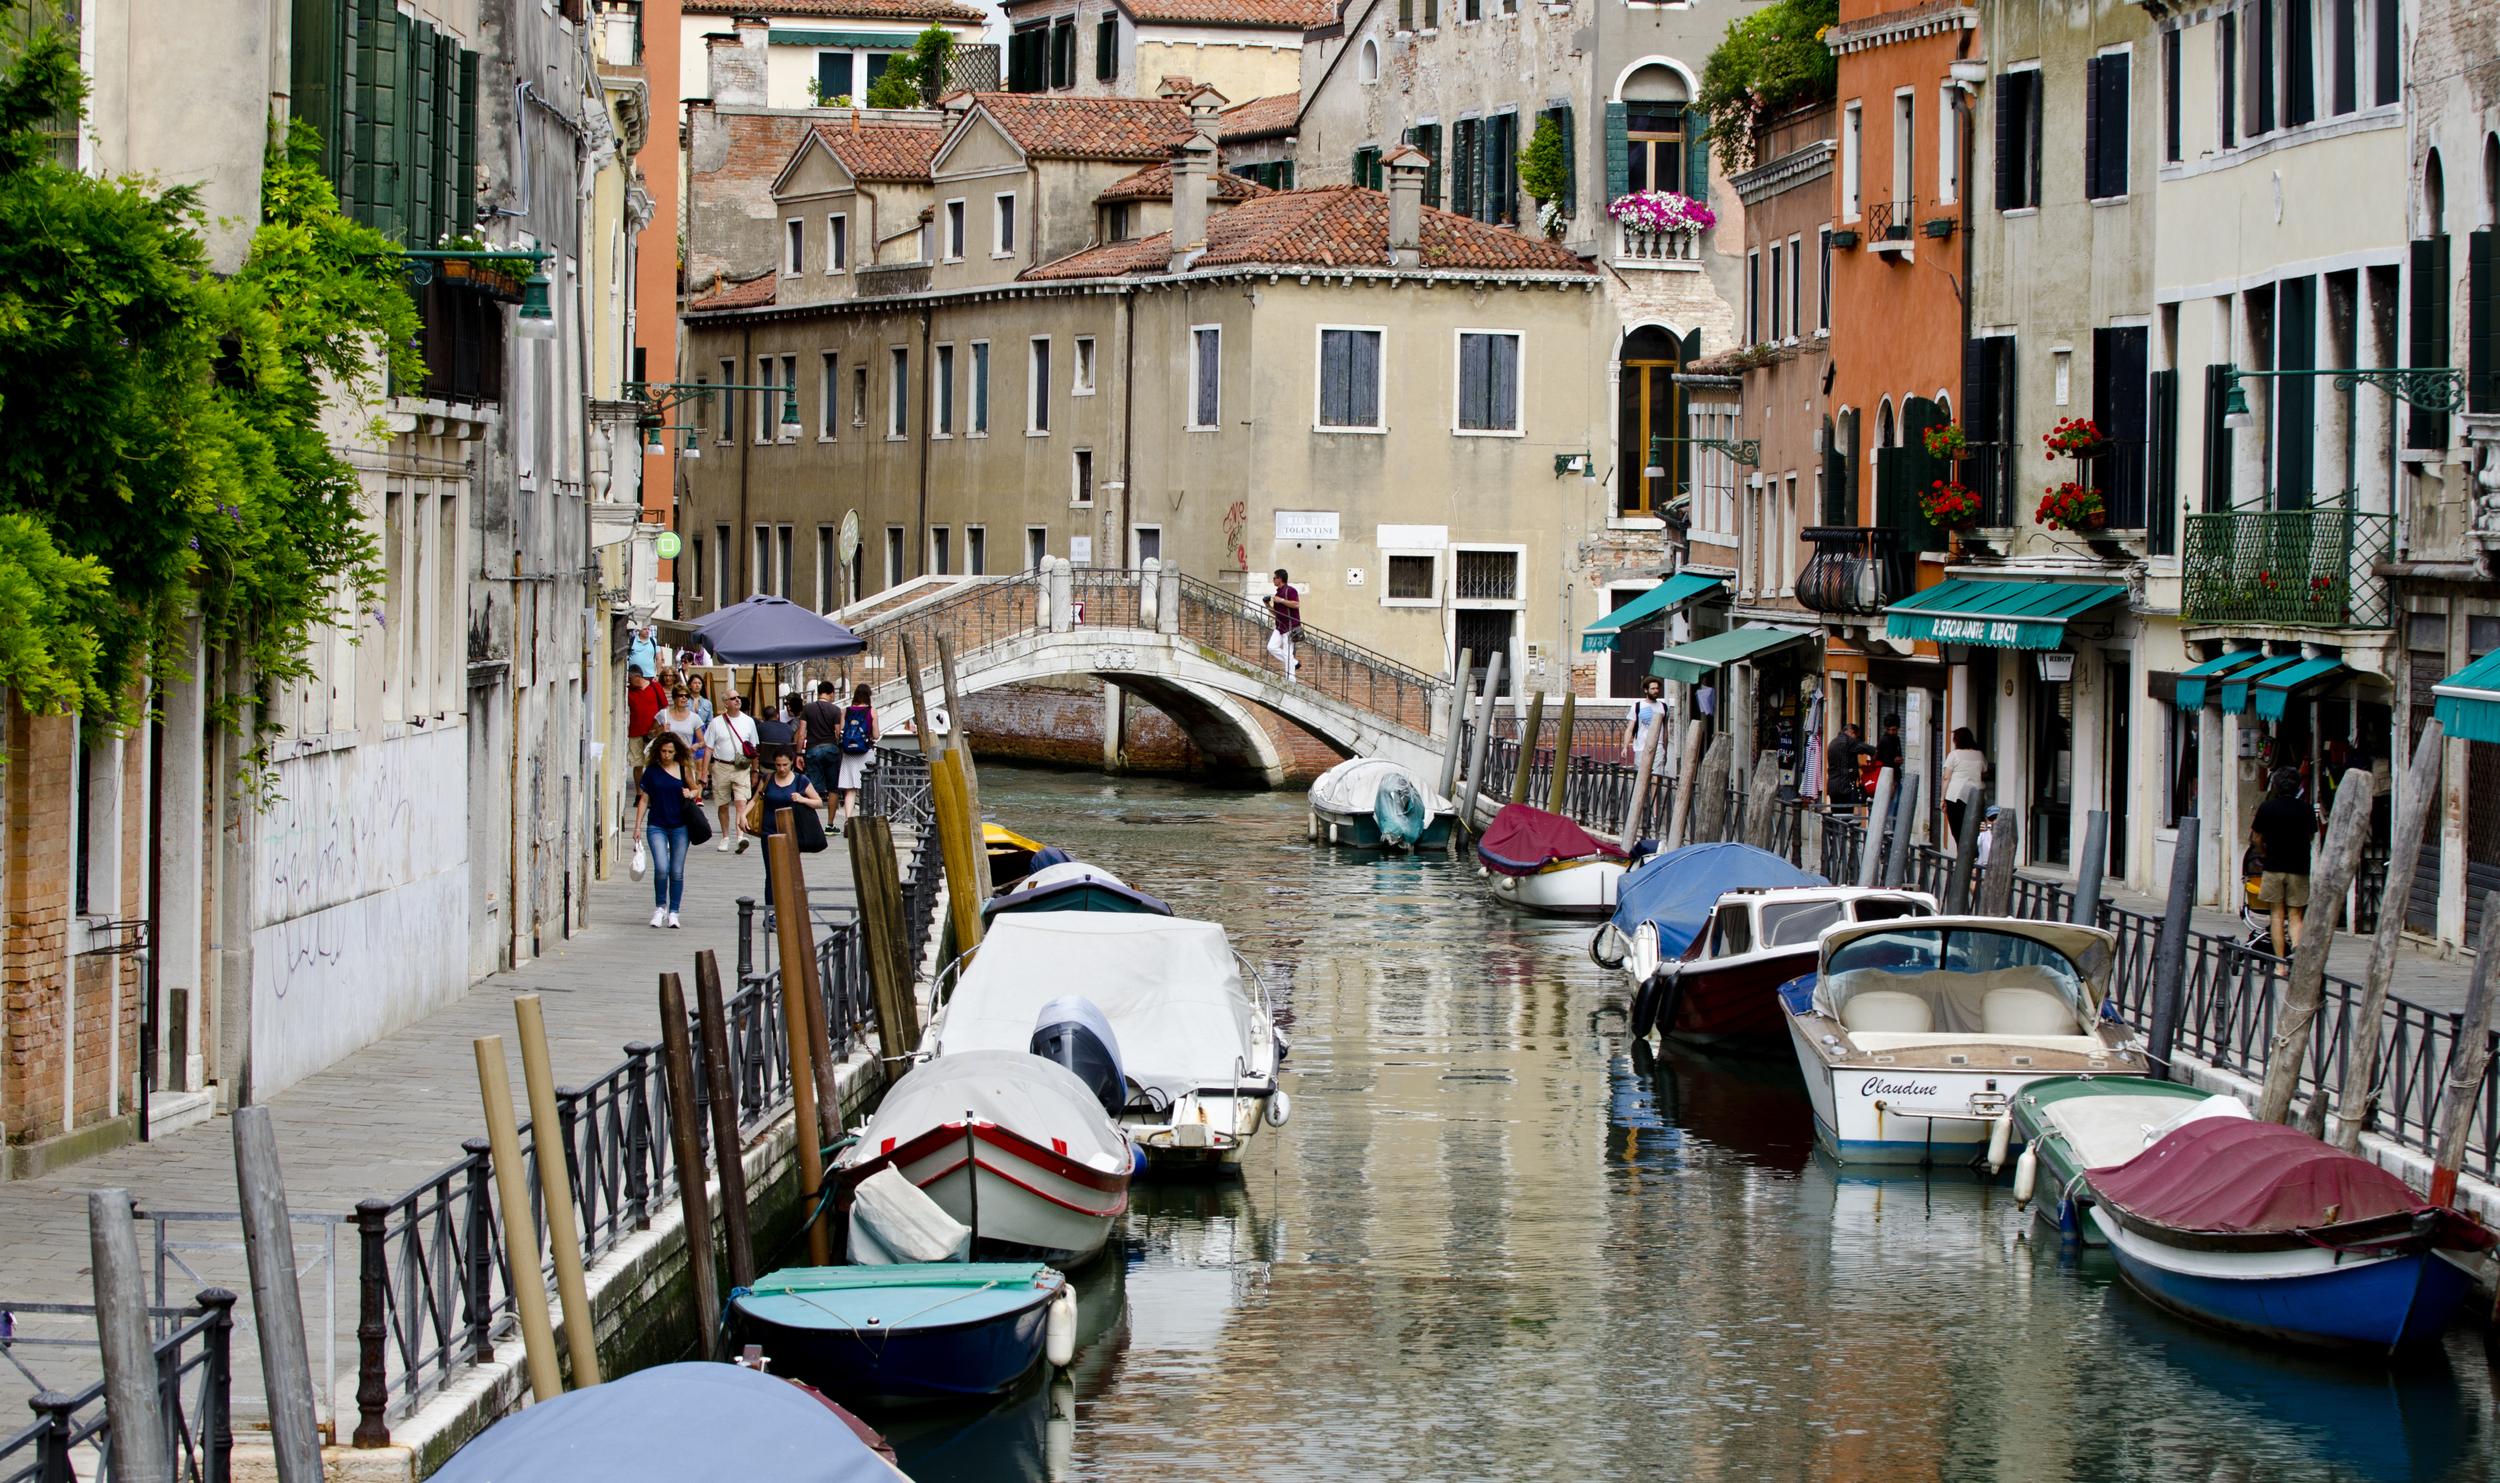 Venice, Italy - June 2014.